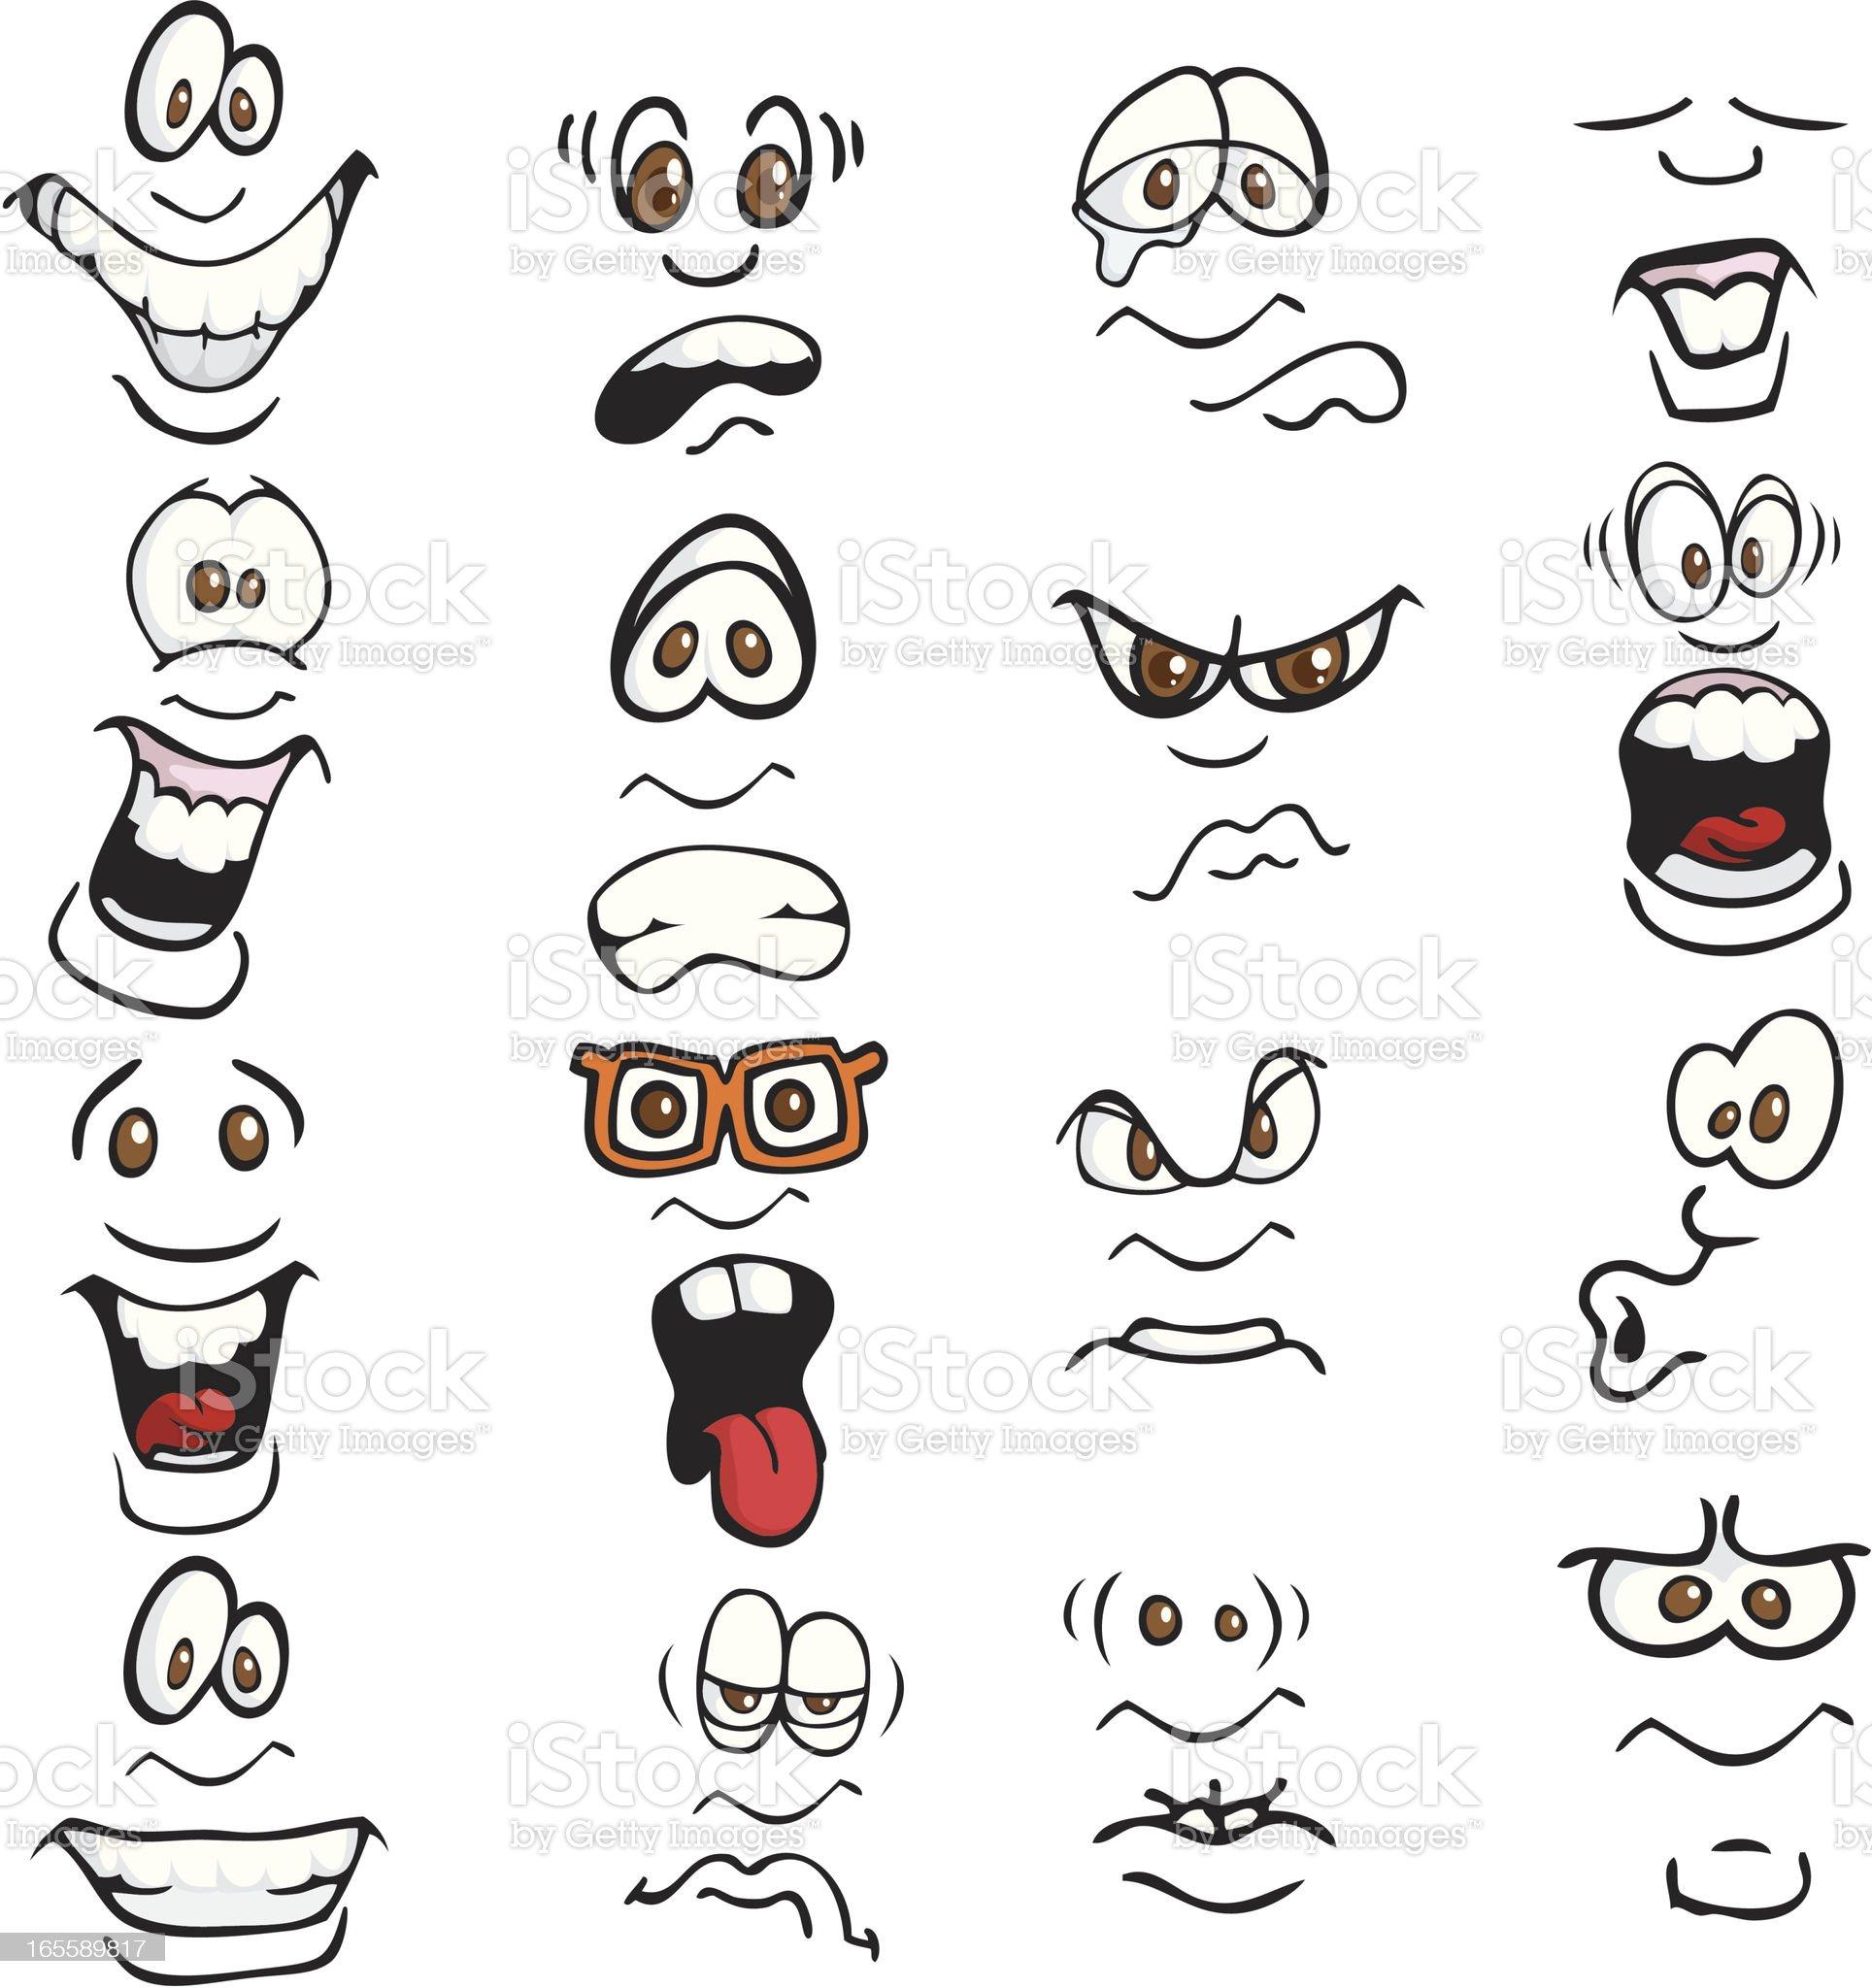 Cartoon Expressions royalty-free stock vector art